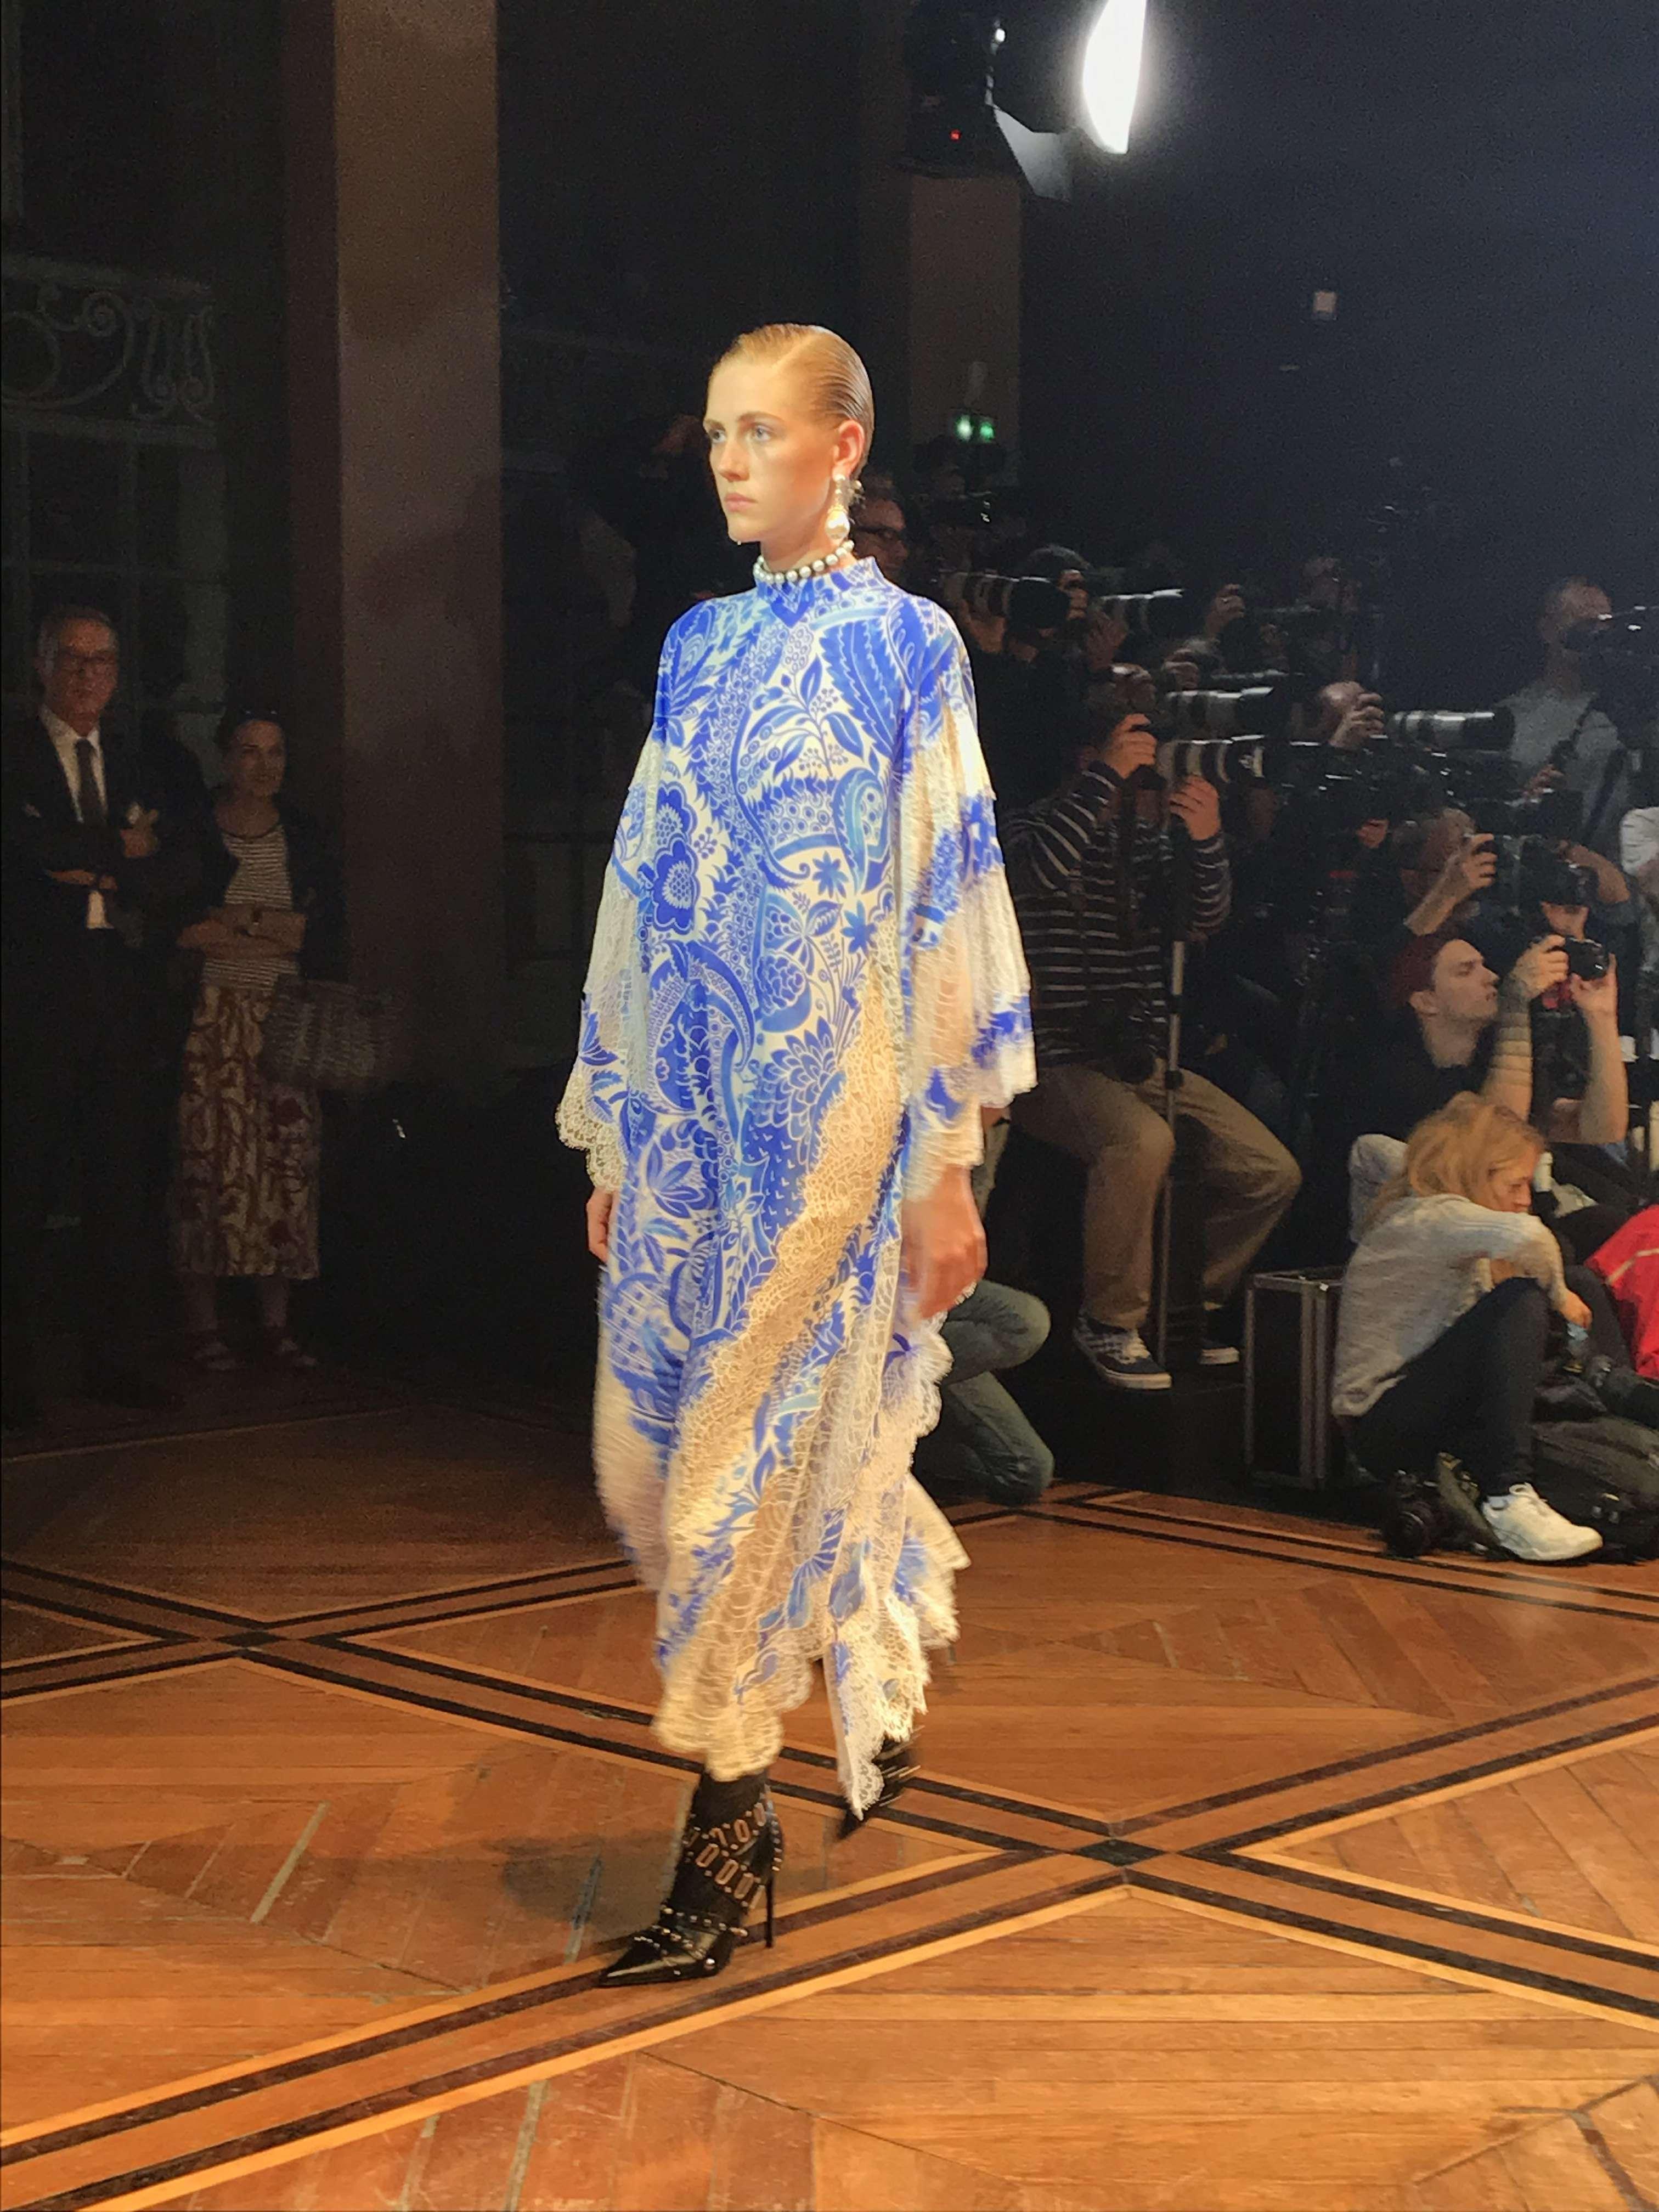 VisteLaCalle en París Fashion Week: El desfile de Andrew Gn S/S 2020